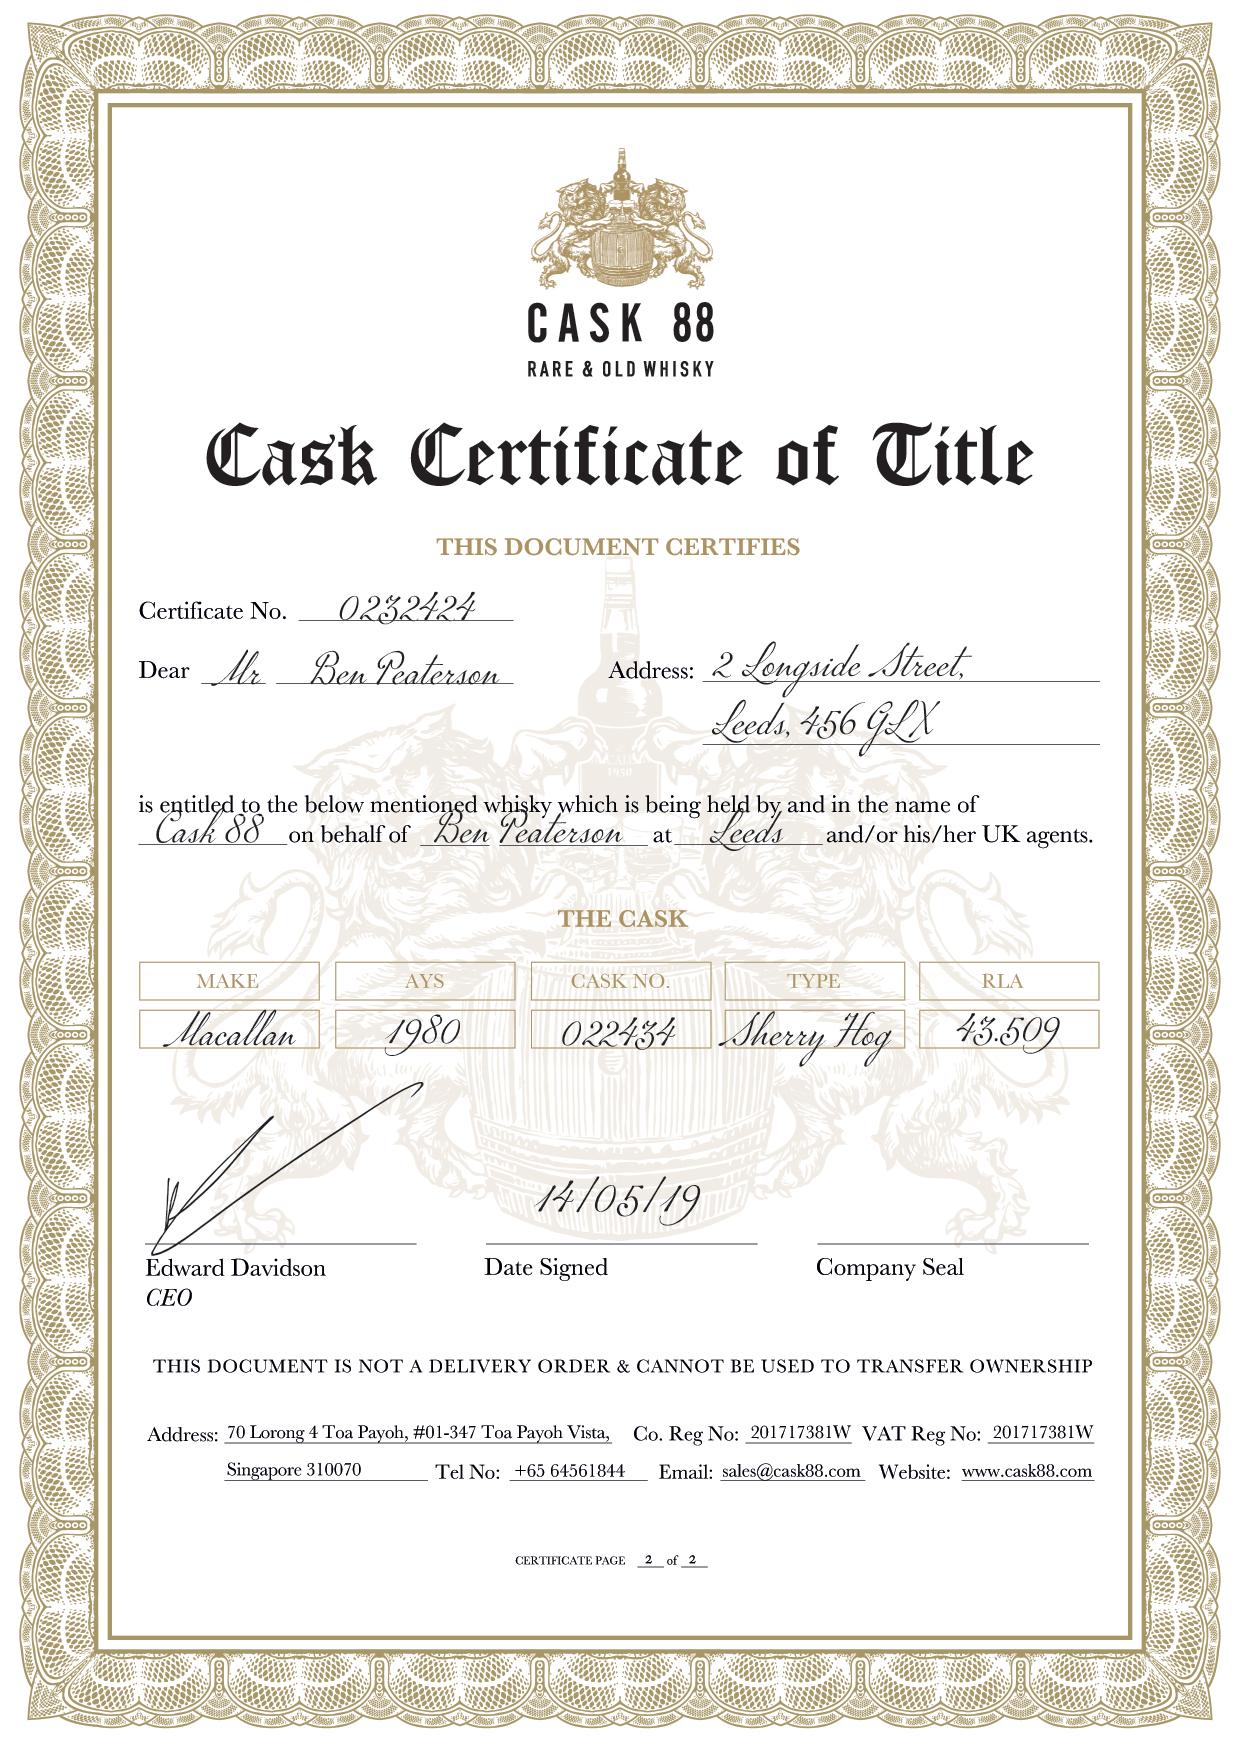 Cask Certificate